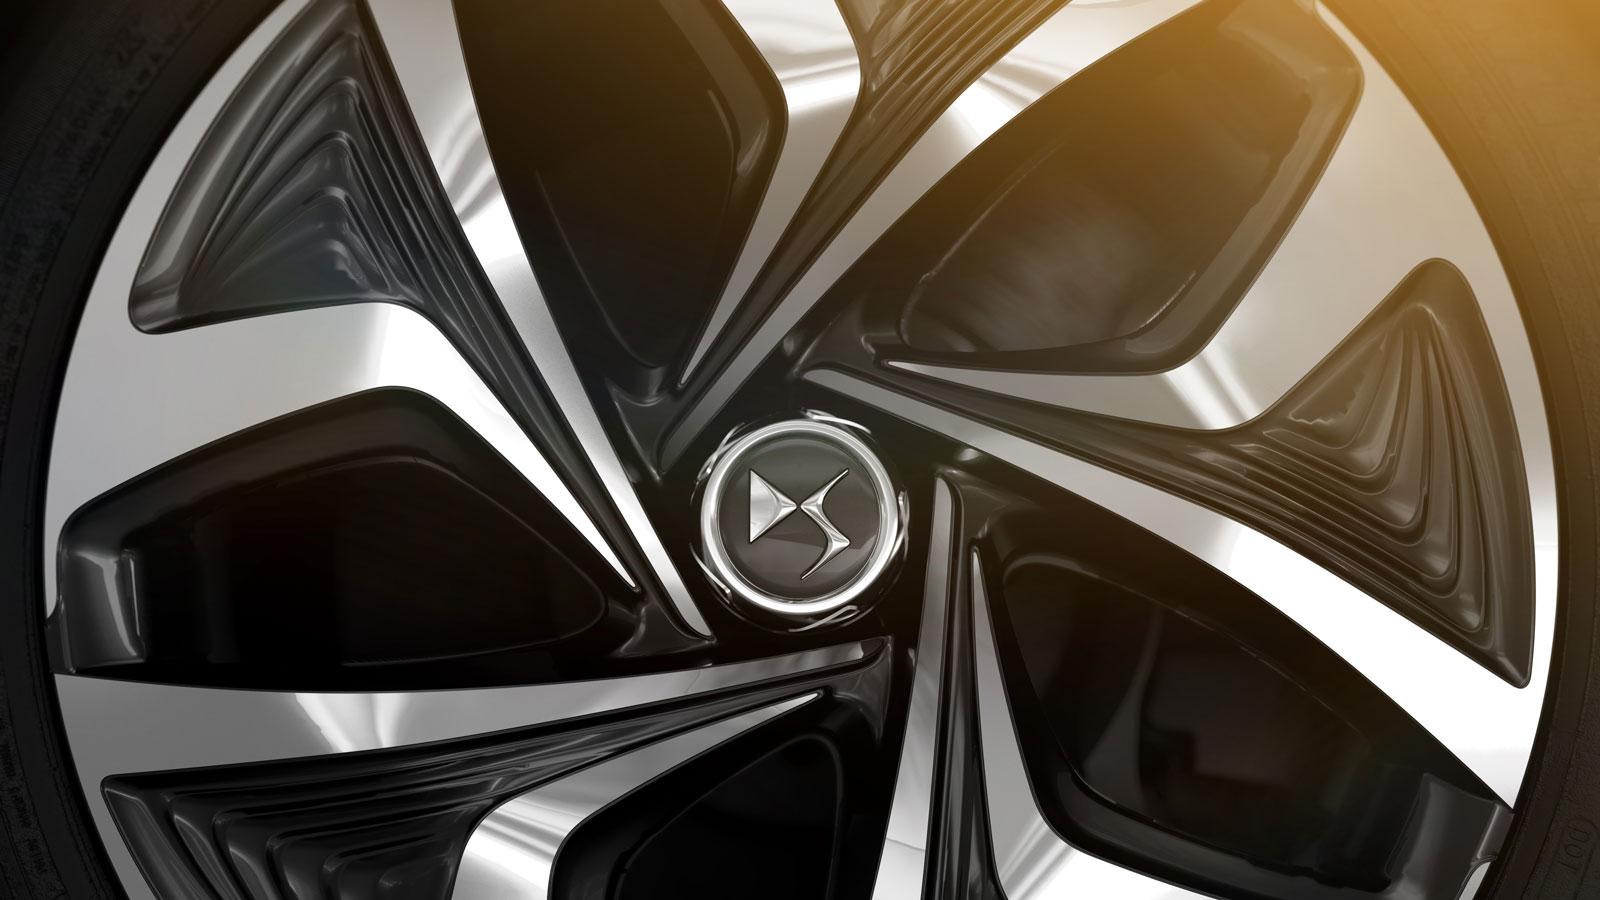 Citroen DS5 White Pearl - Wheel - Car Body Design